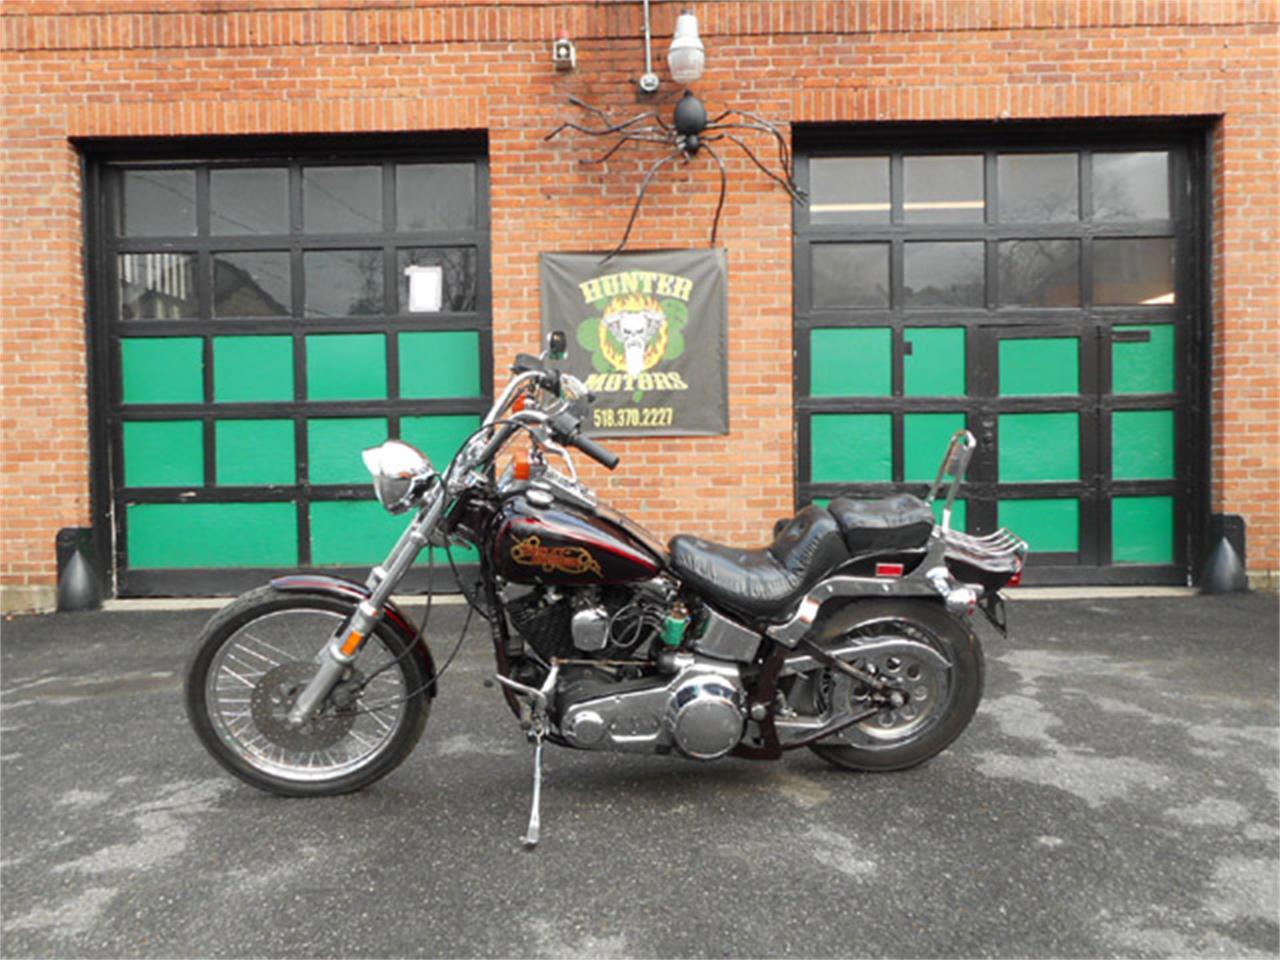 1988 Harley Davidson Fsxtc For Sale Classiccars Com Cc 948979